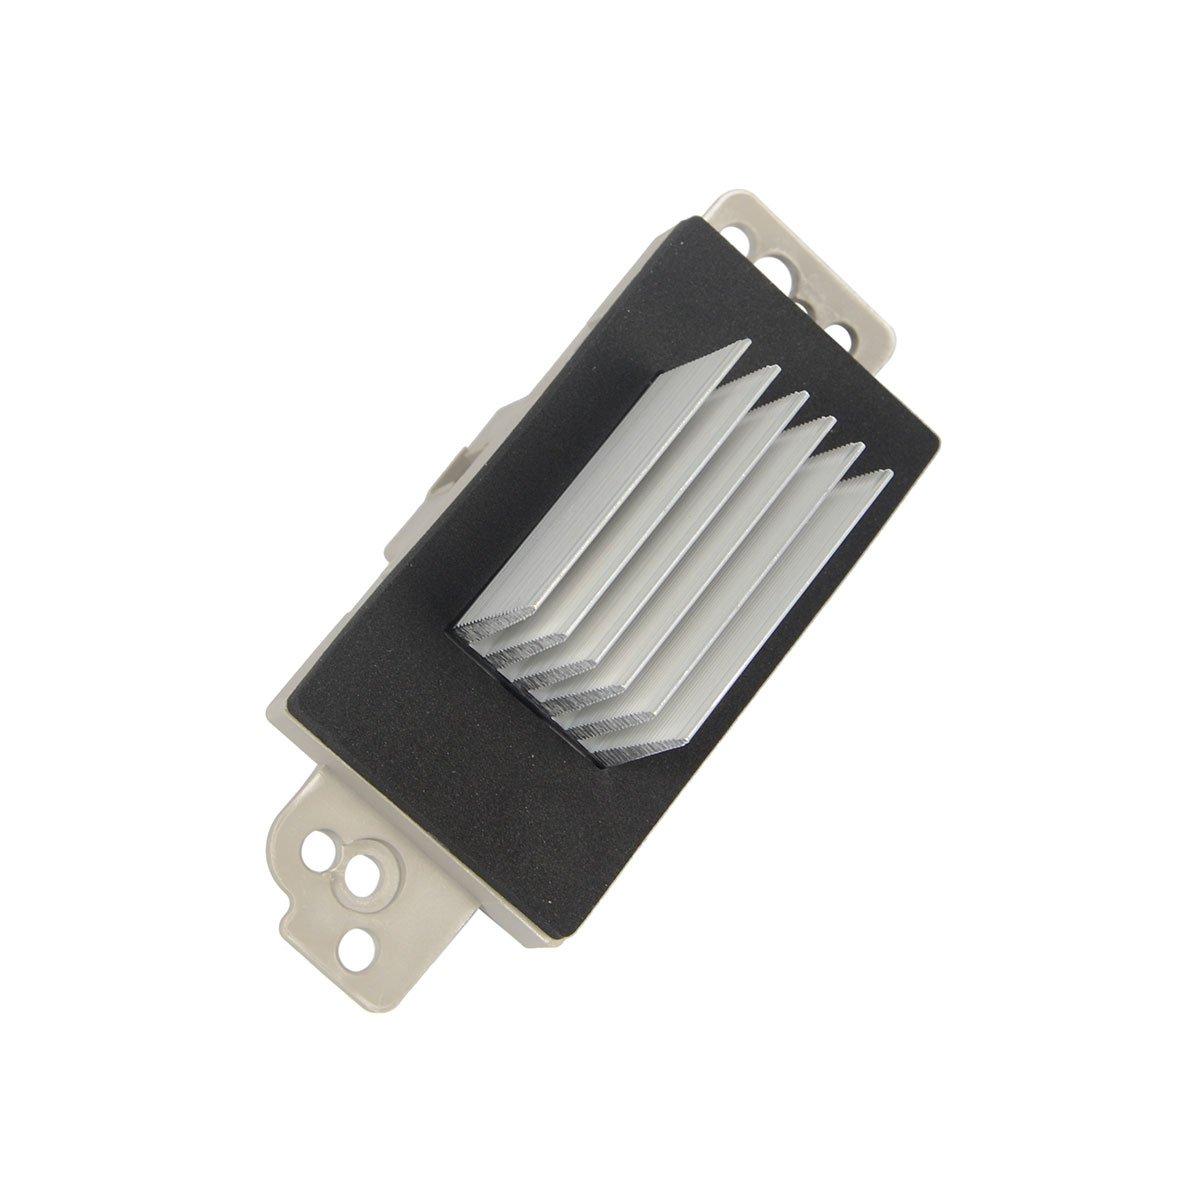 AC Heater Blower Motor Resistor for Chevrolet Silverado 1500 2500 3500 GMC Sierra Envoy Yukon Cadillac Escalade